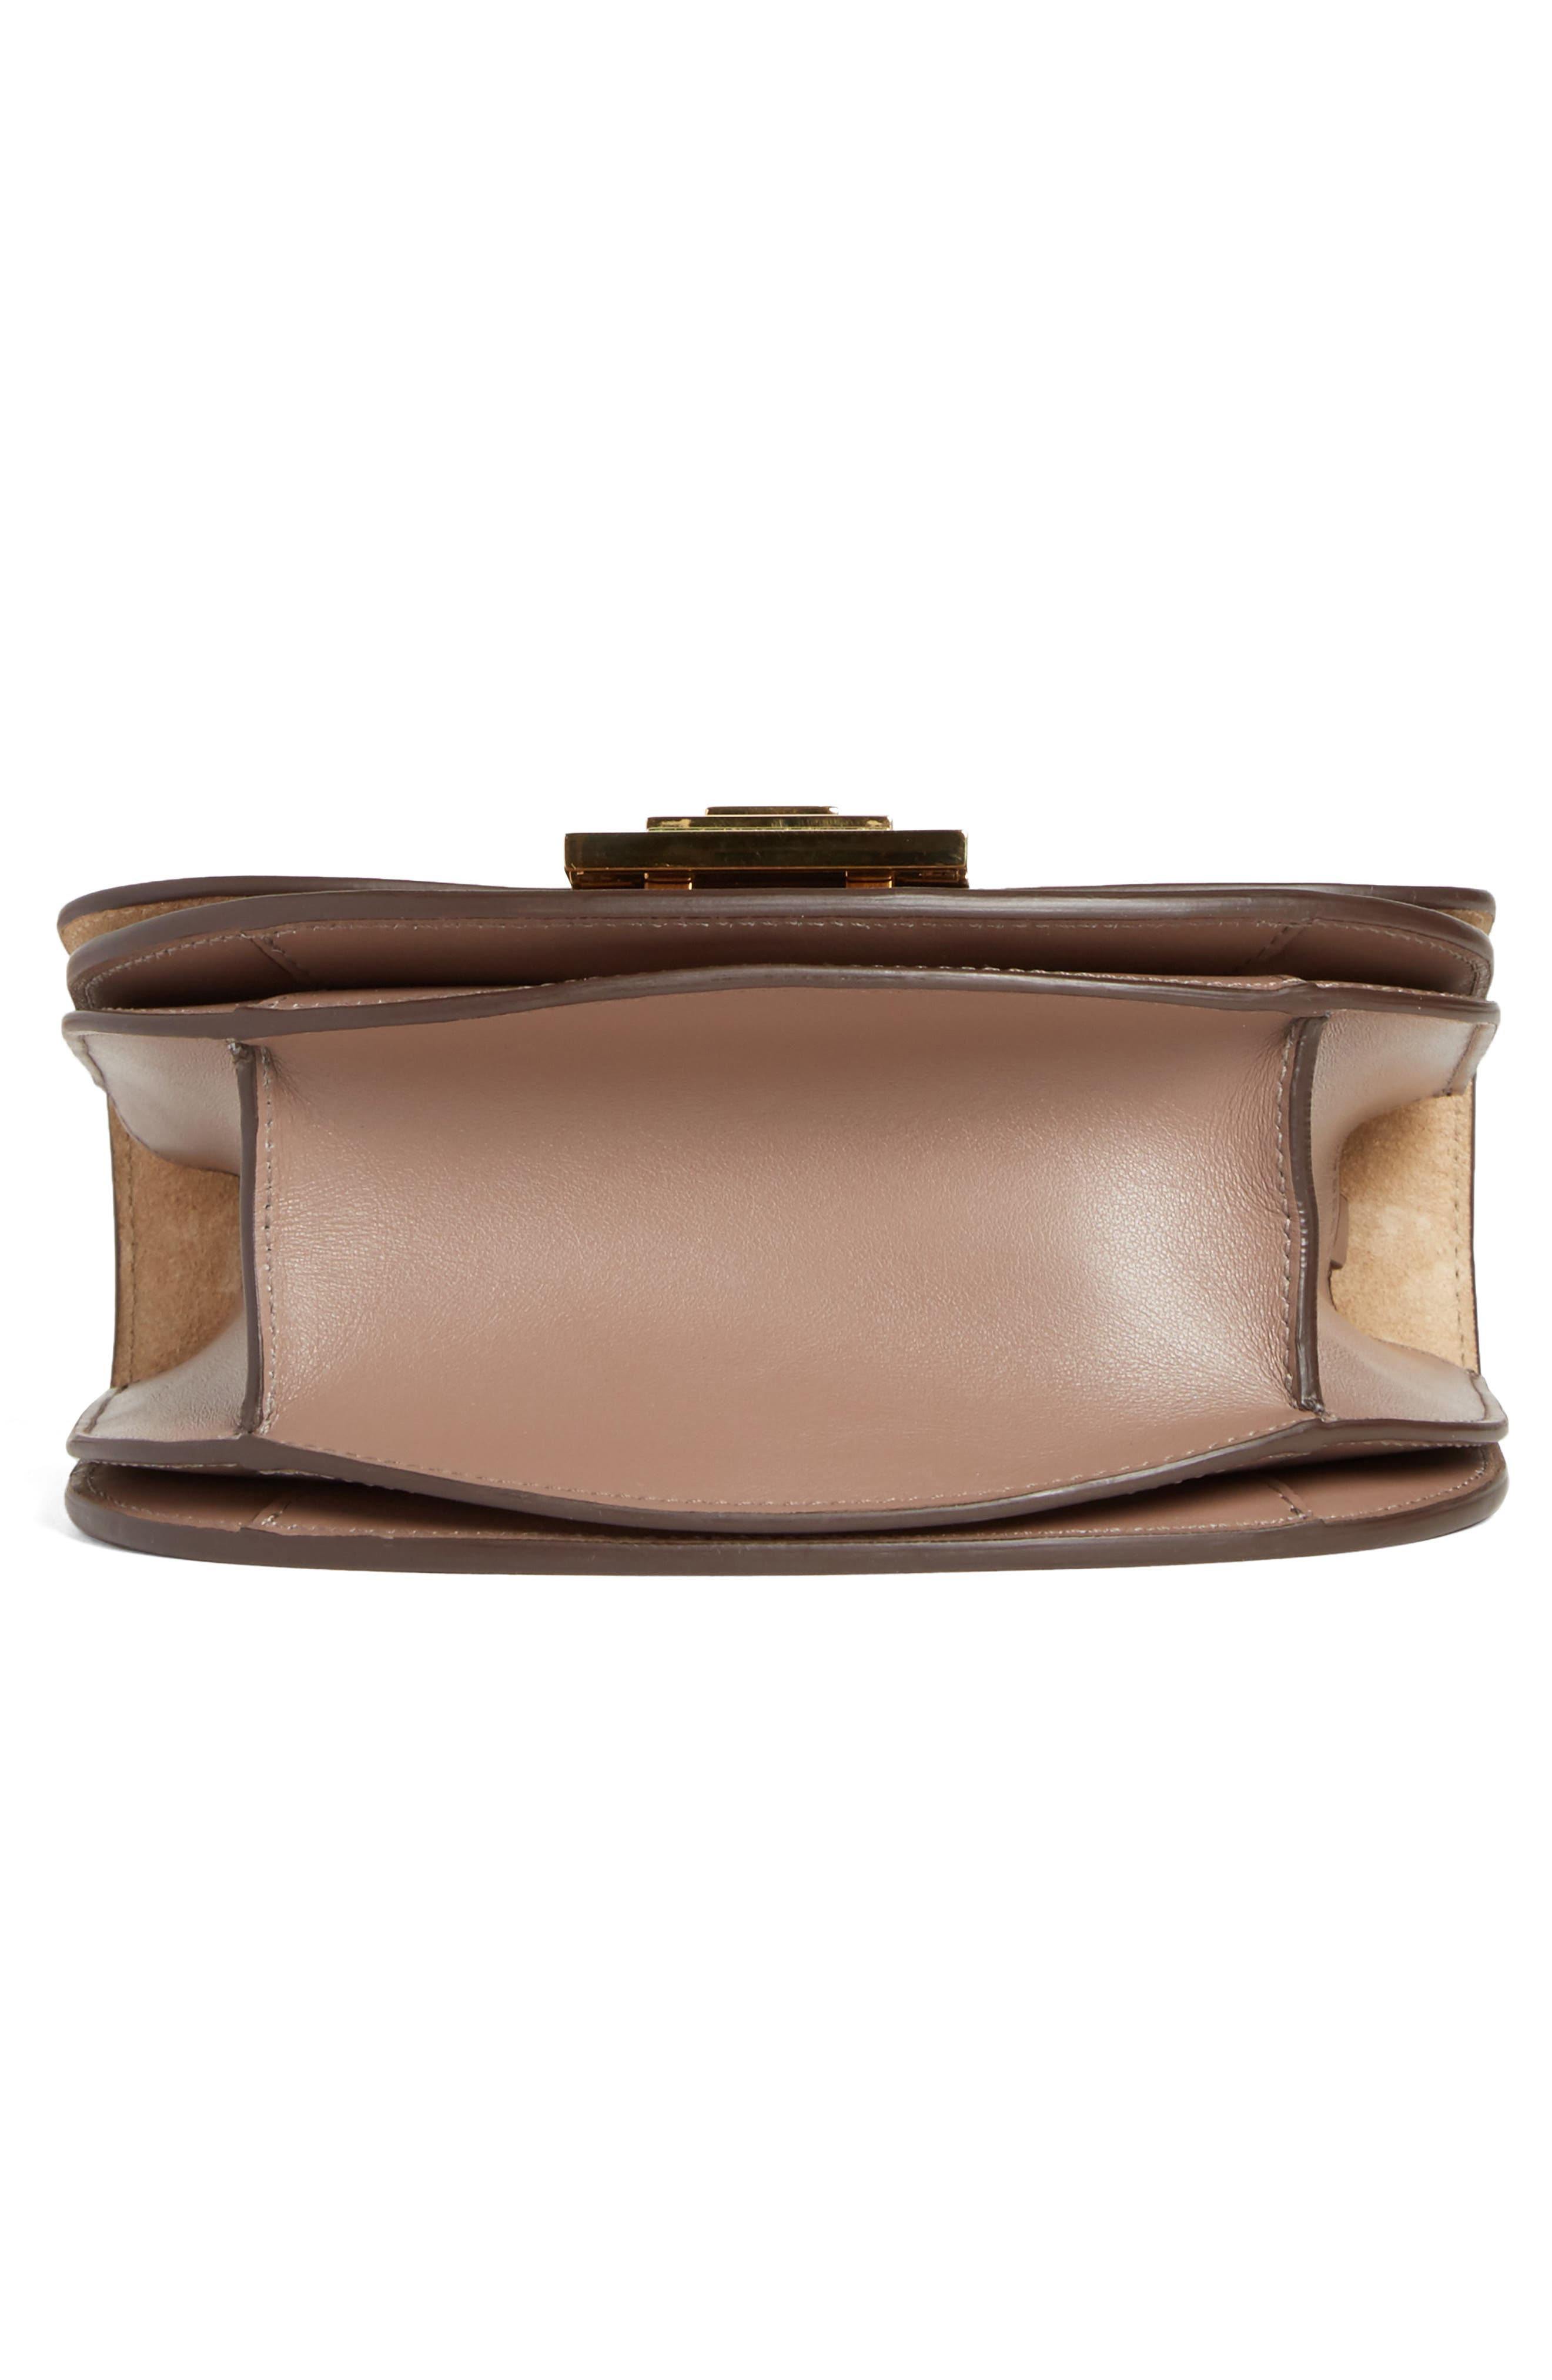 Medium Box Leather Shoulder Bag,                             Alternate thumbnail 6, color,                             200